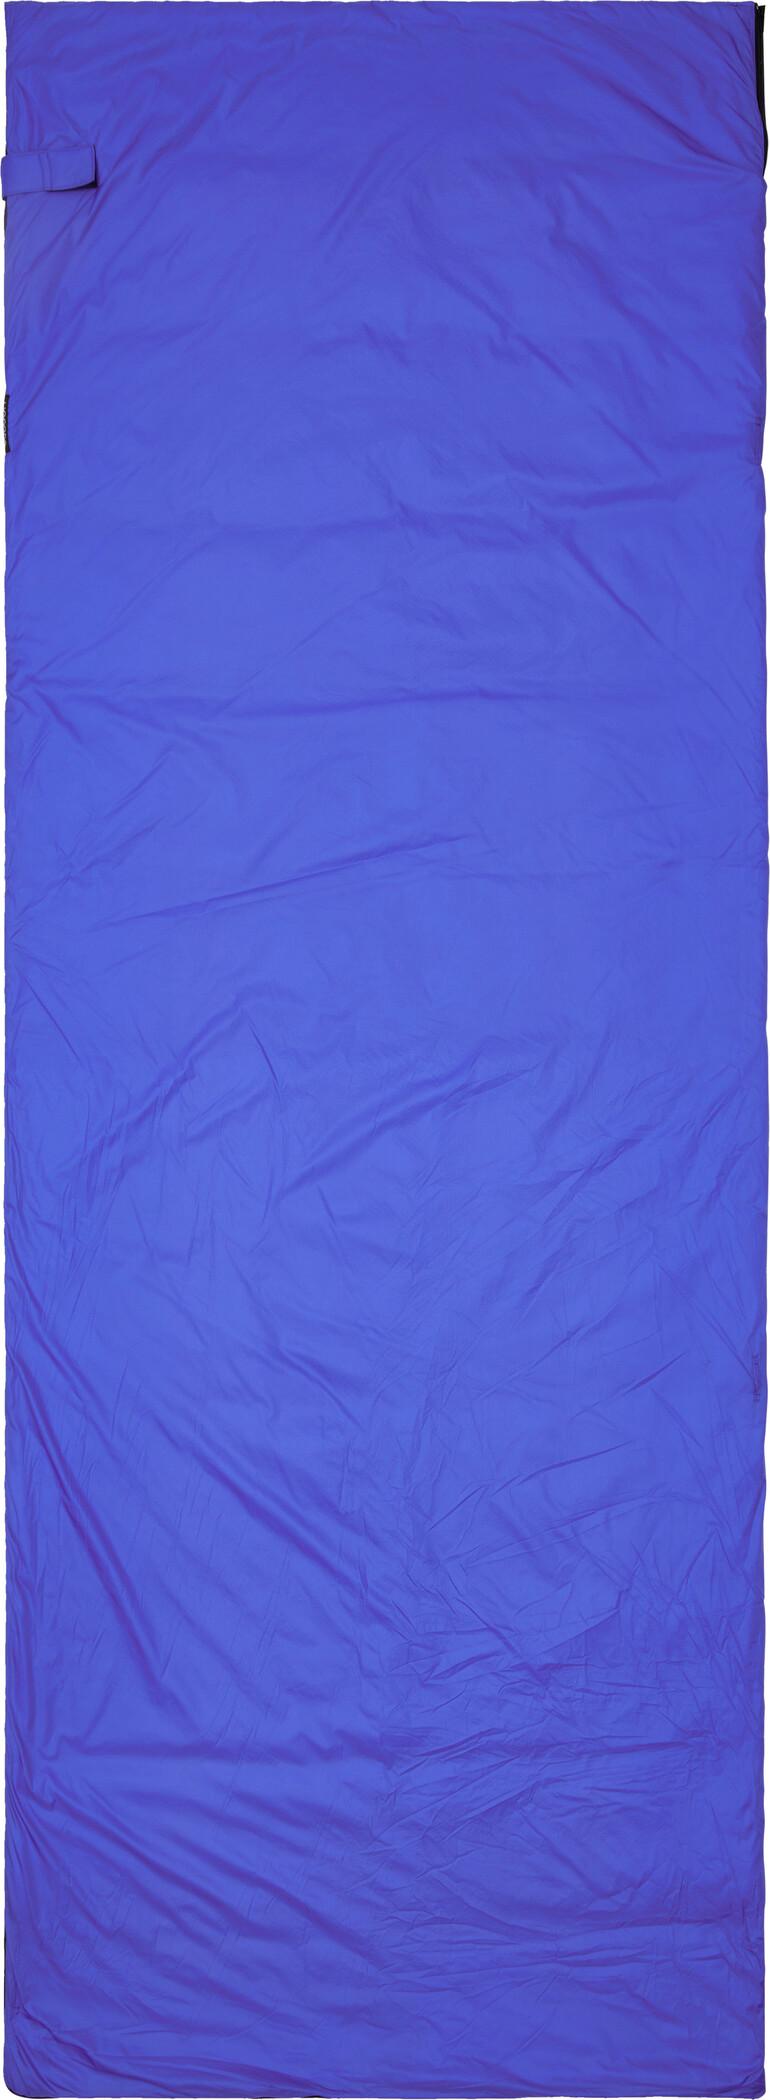 Cocoon Tropic Traveler Sovepose Silk Long, royal blue/tuareg (2019) | Misc. Transportation and Storage